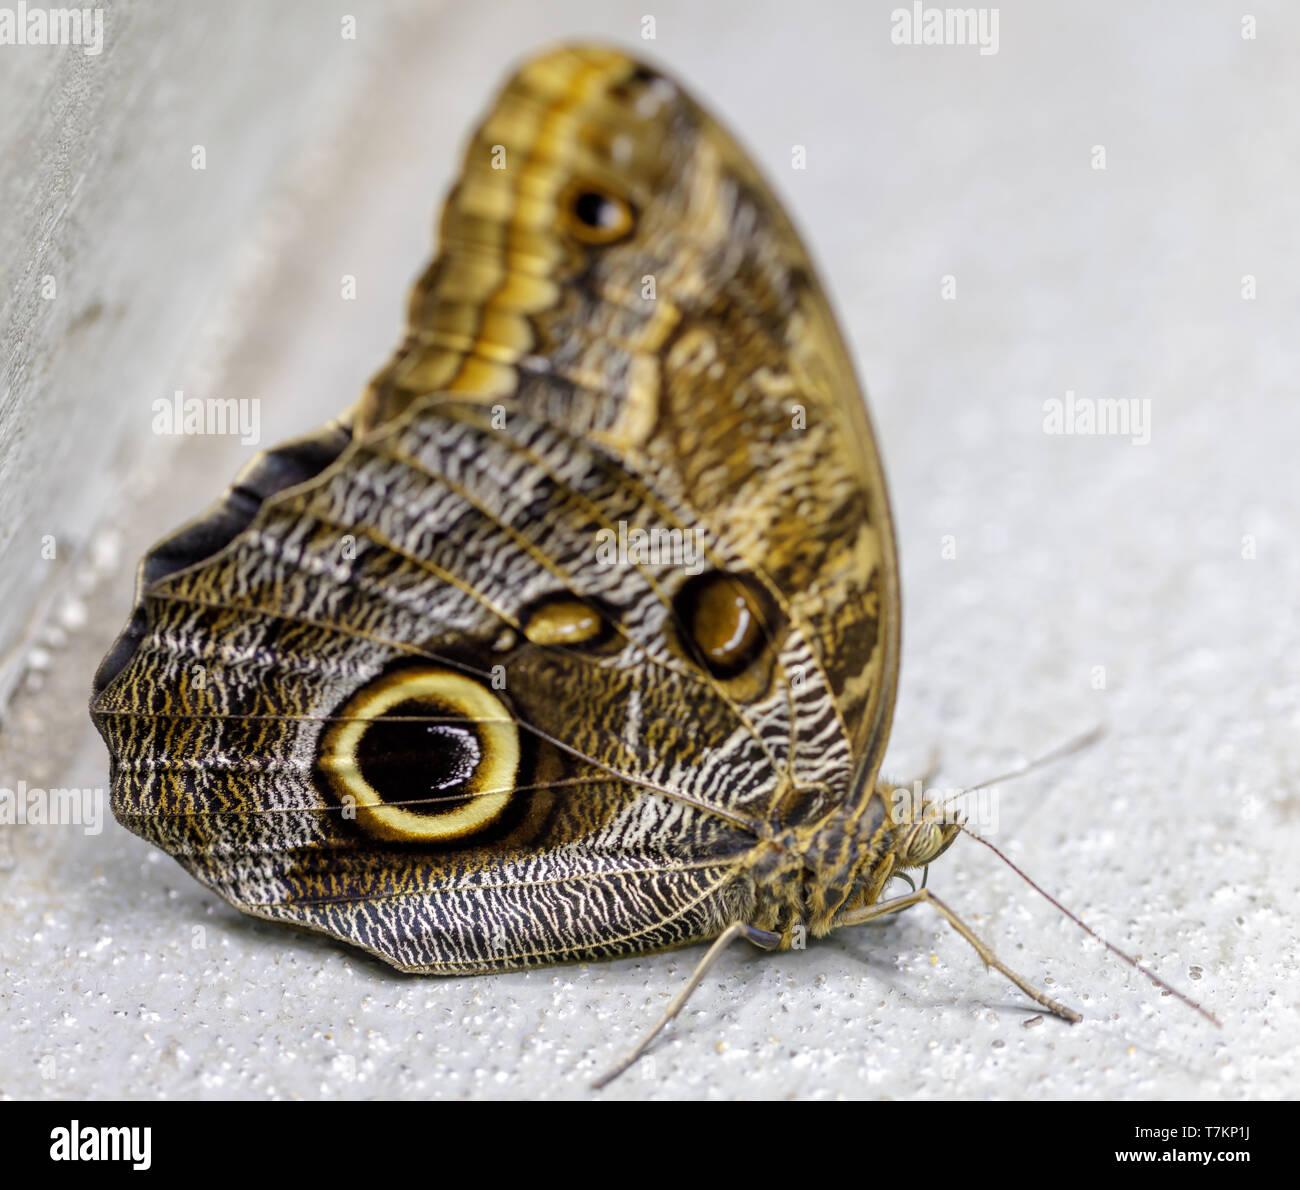 Owl butterfly (Caligo memnon) isolated. - Stock Image